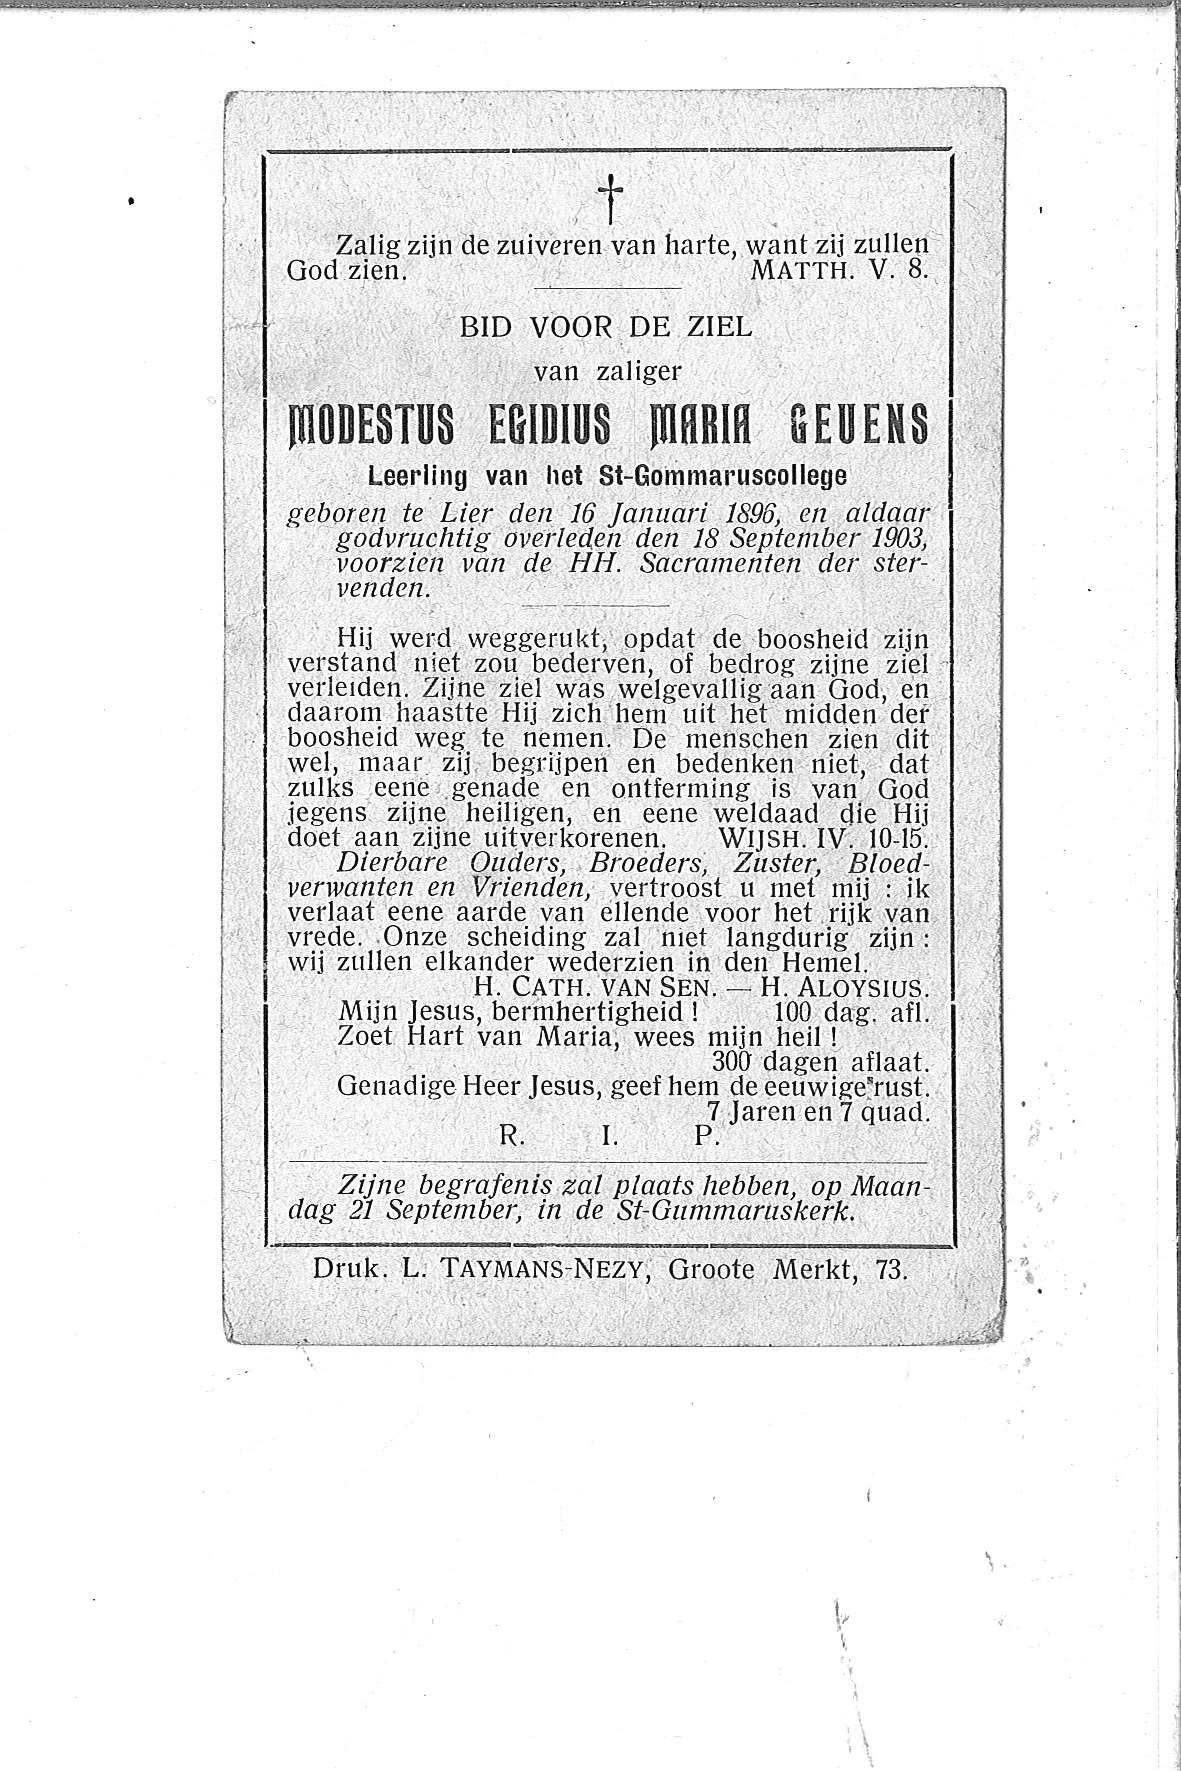 Modestus - Egidius - Maria (1903)20131210144048_00027.jpg